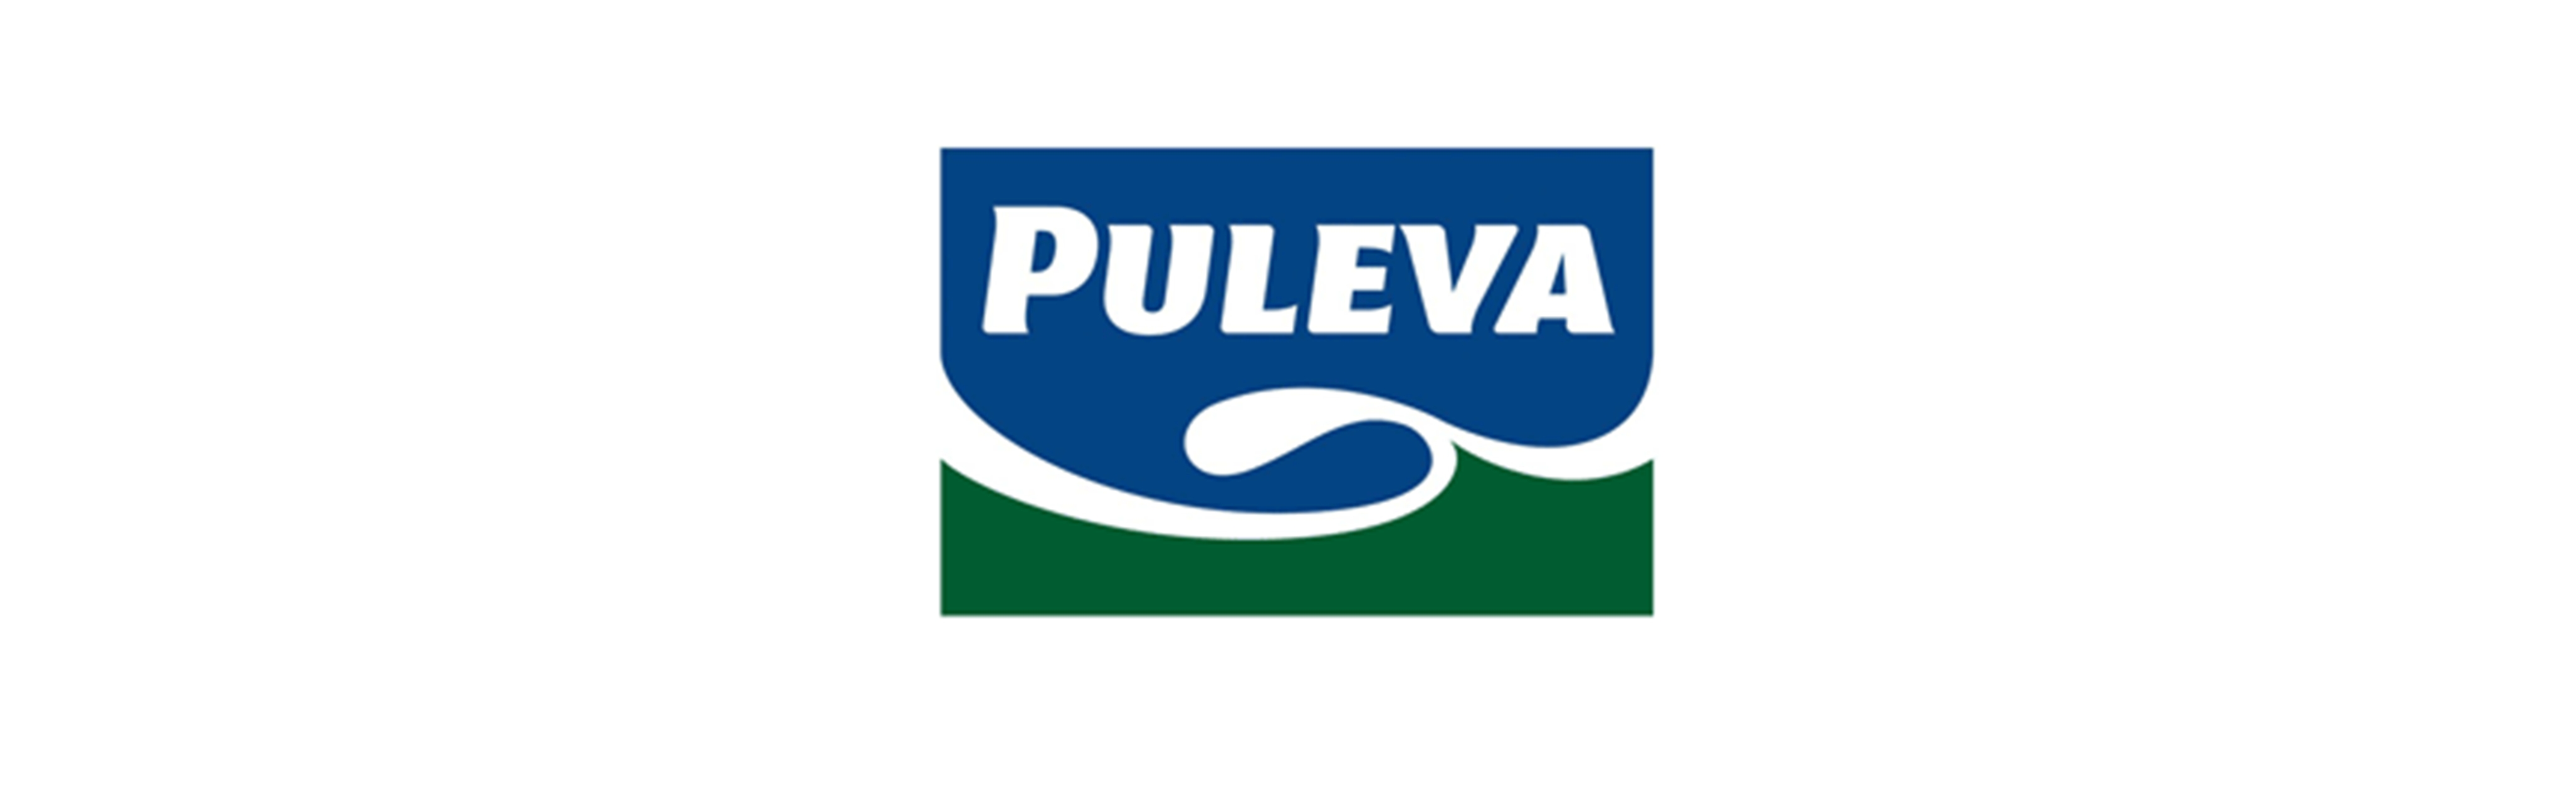 Logo de Puleva